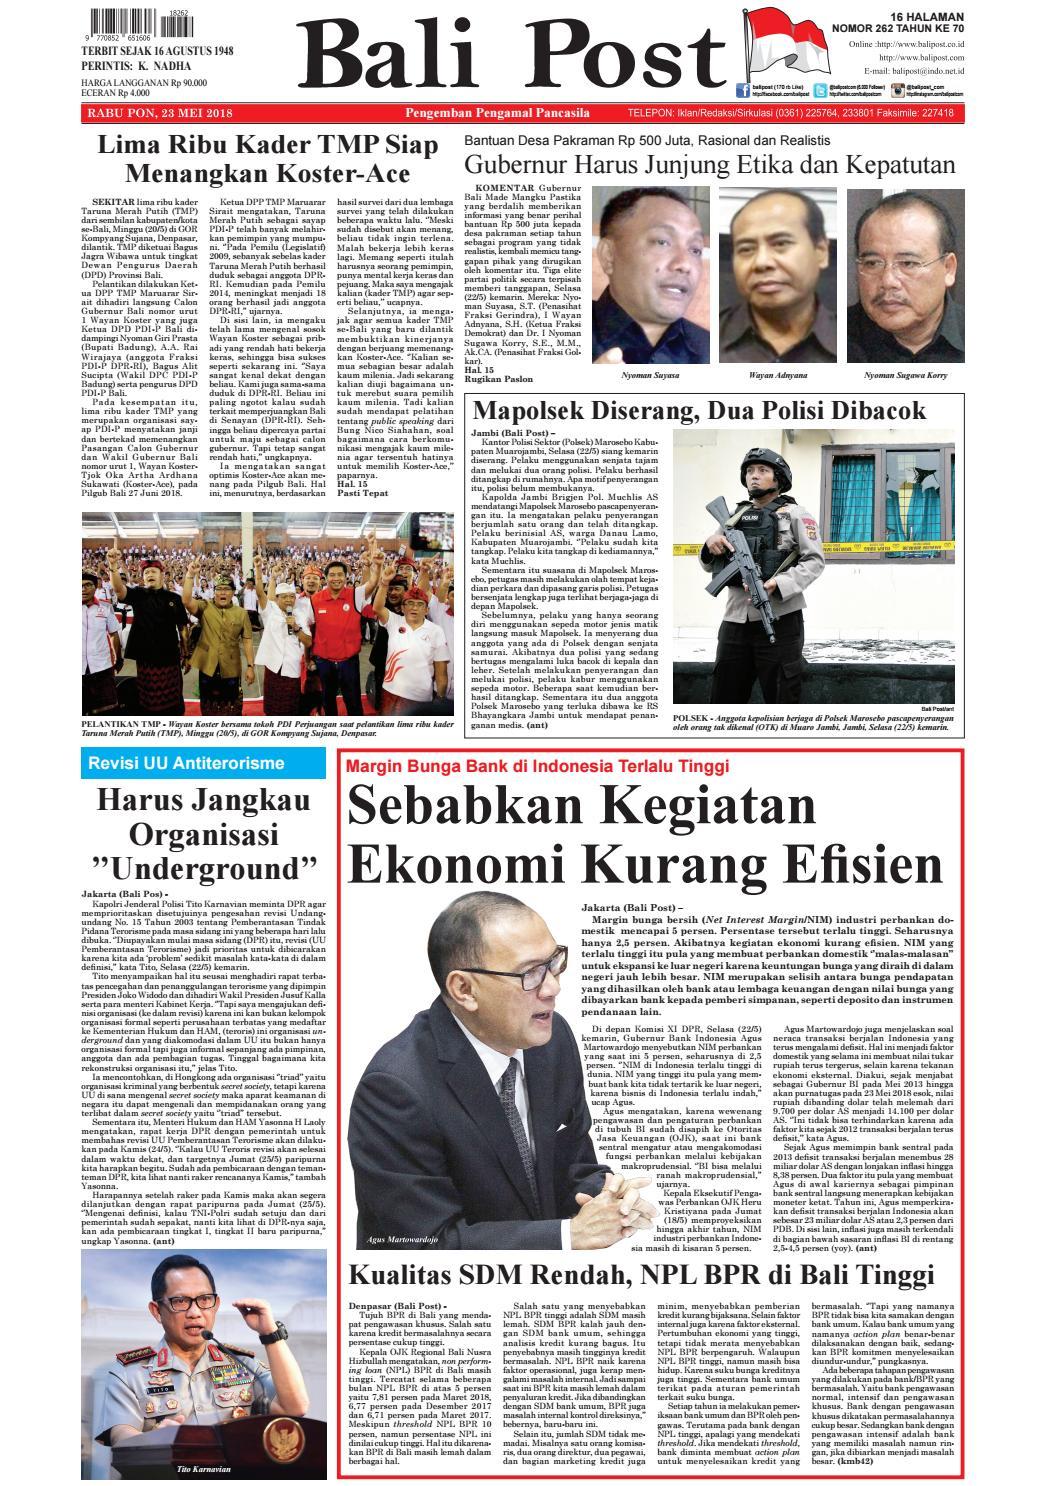 Edisi Rabu 23 Mei 2018 Balipostcom By E Paper Kmb Issuu Produk Ukm Bumn Bale Sehat Teh Rosella Merah 3 Box